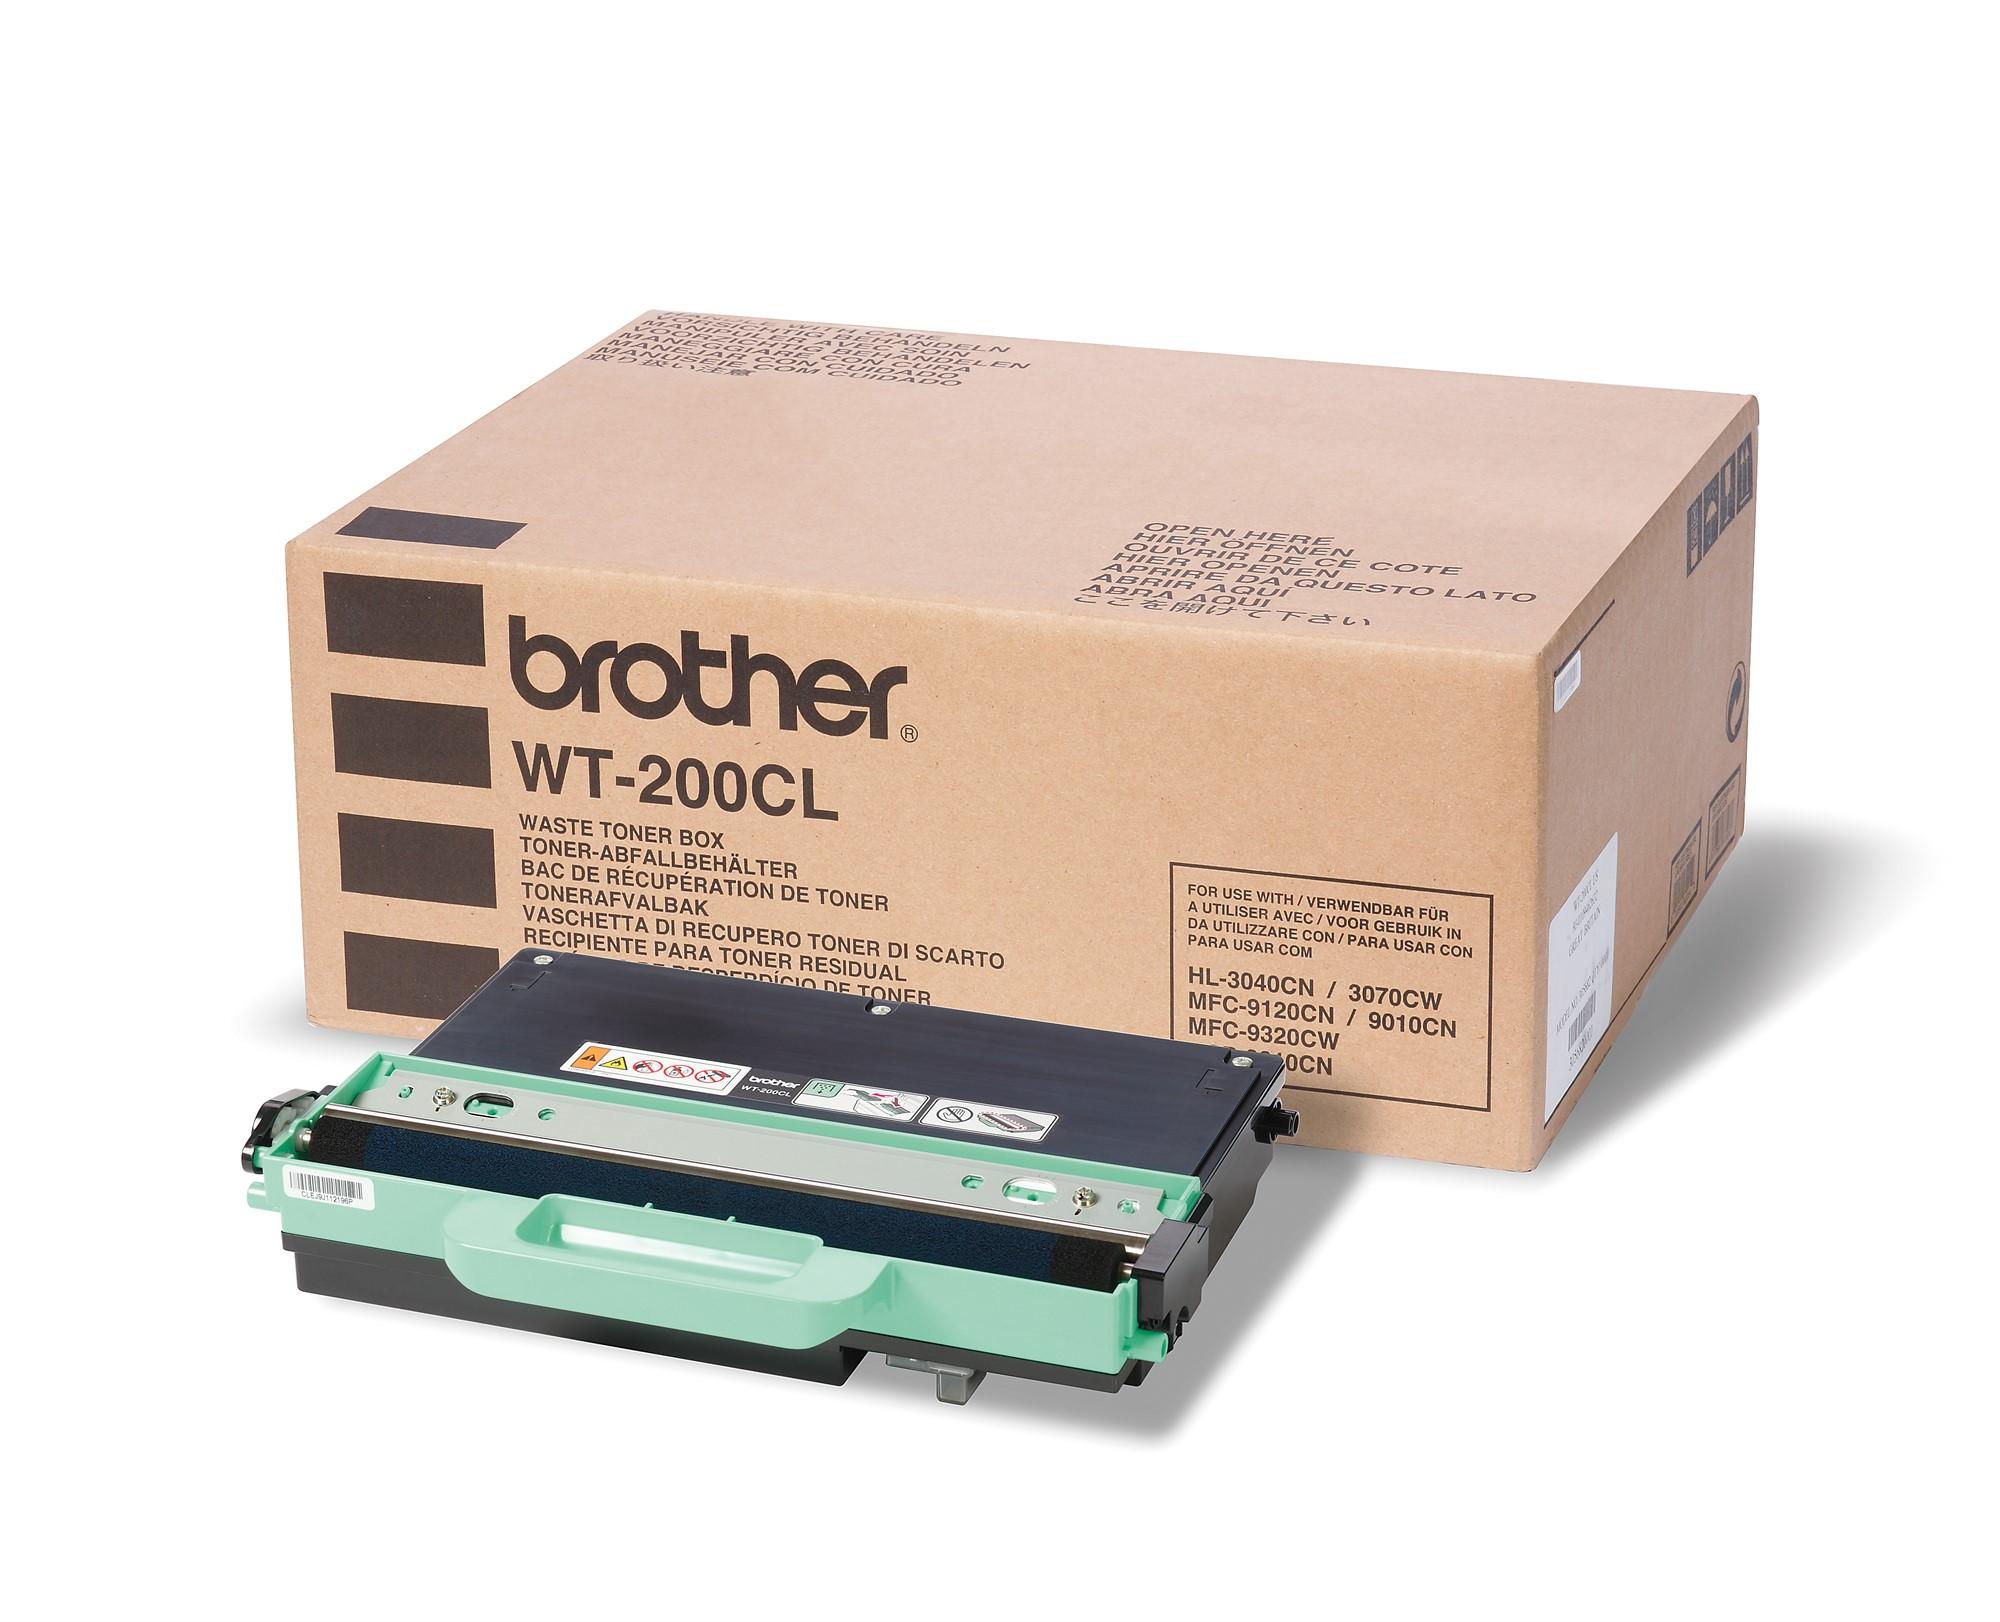 Brother Waste Toner Unit WT200CL